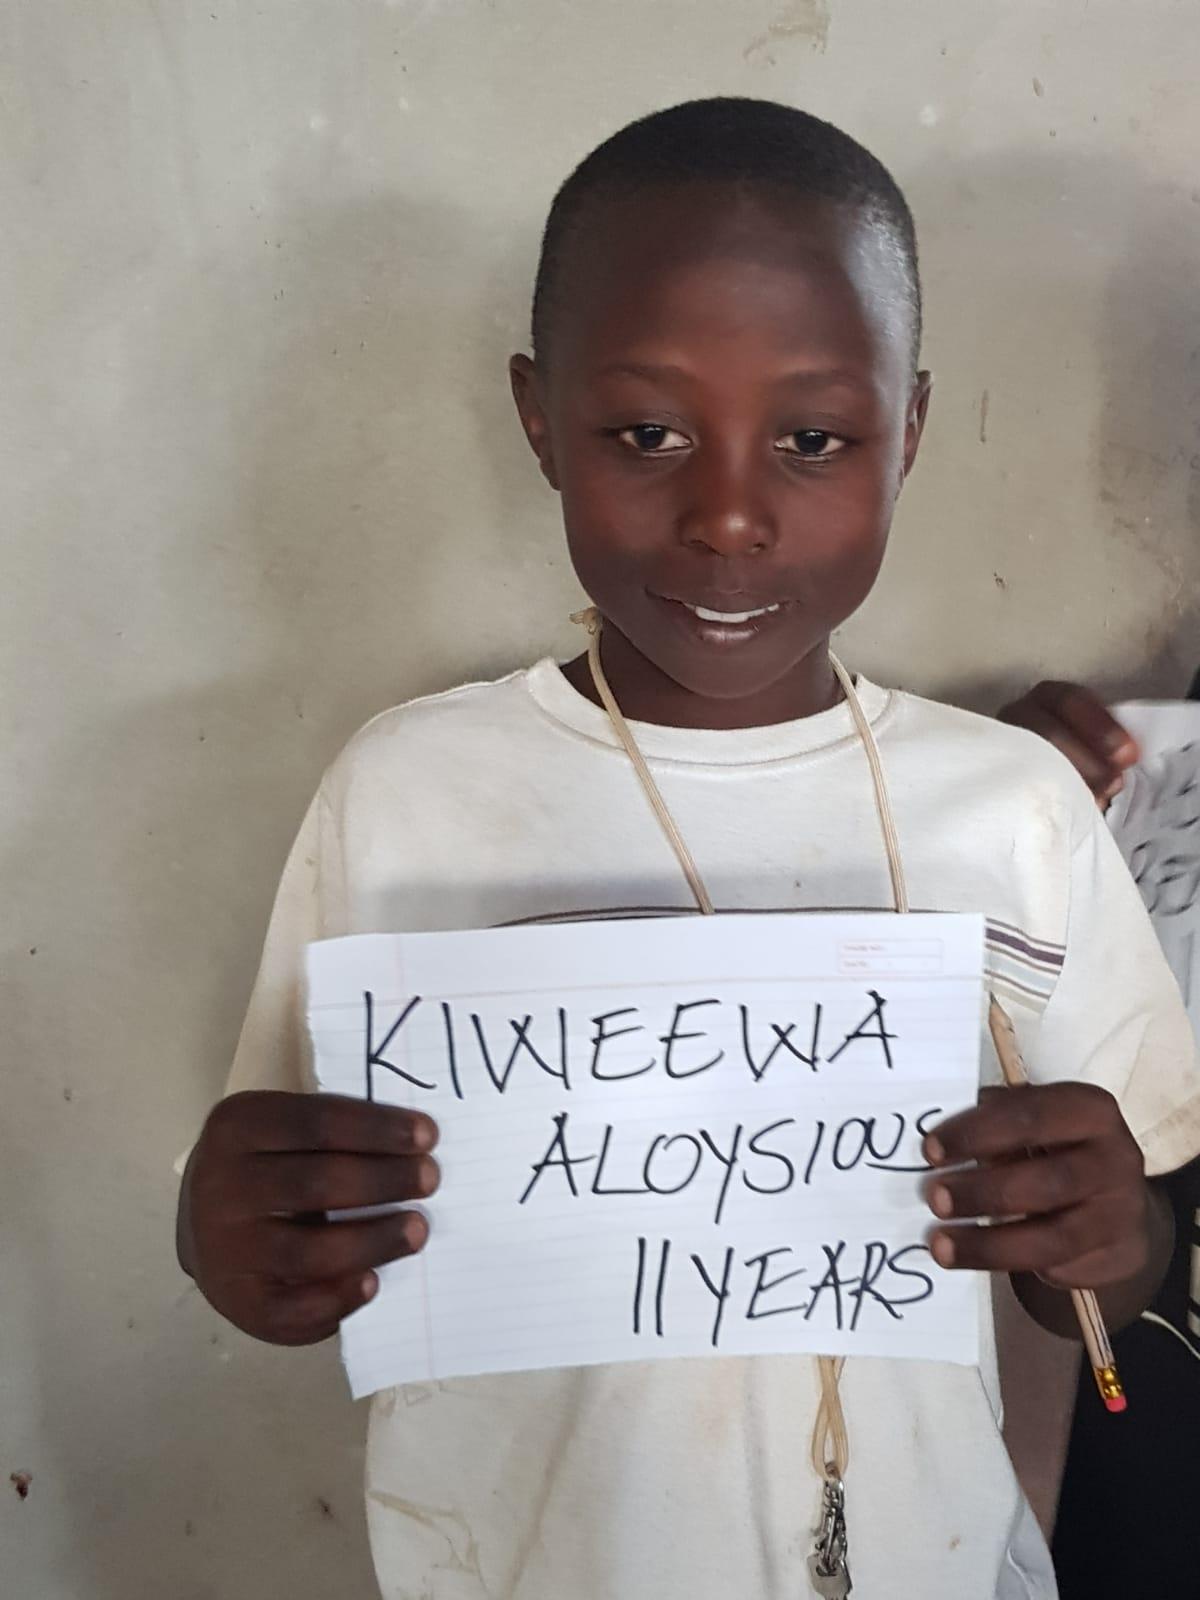 Kiweewa,Aloysious